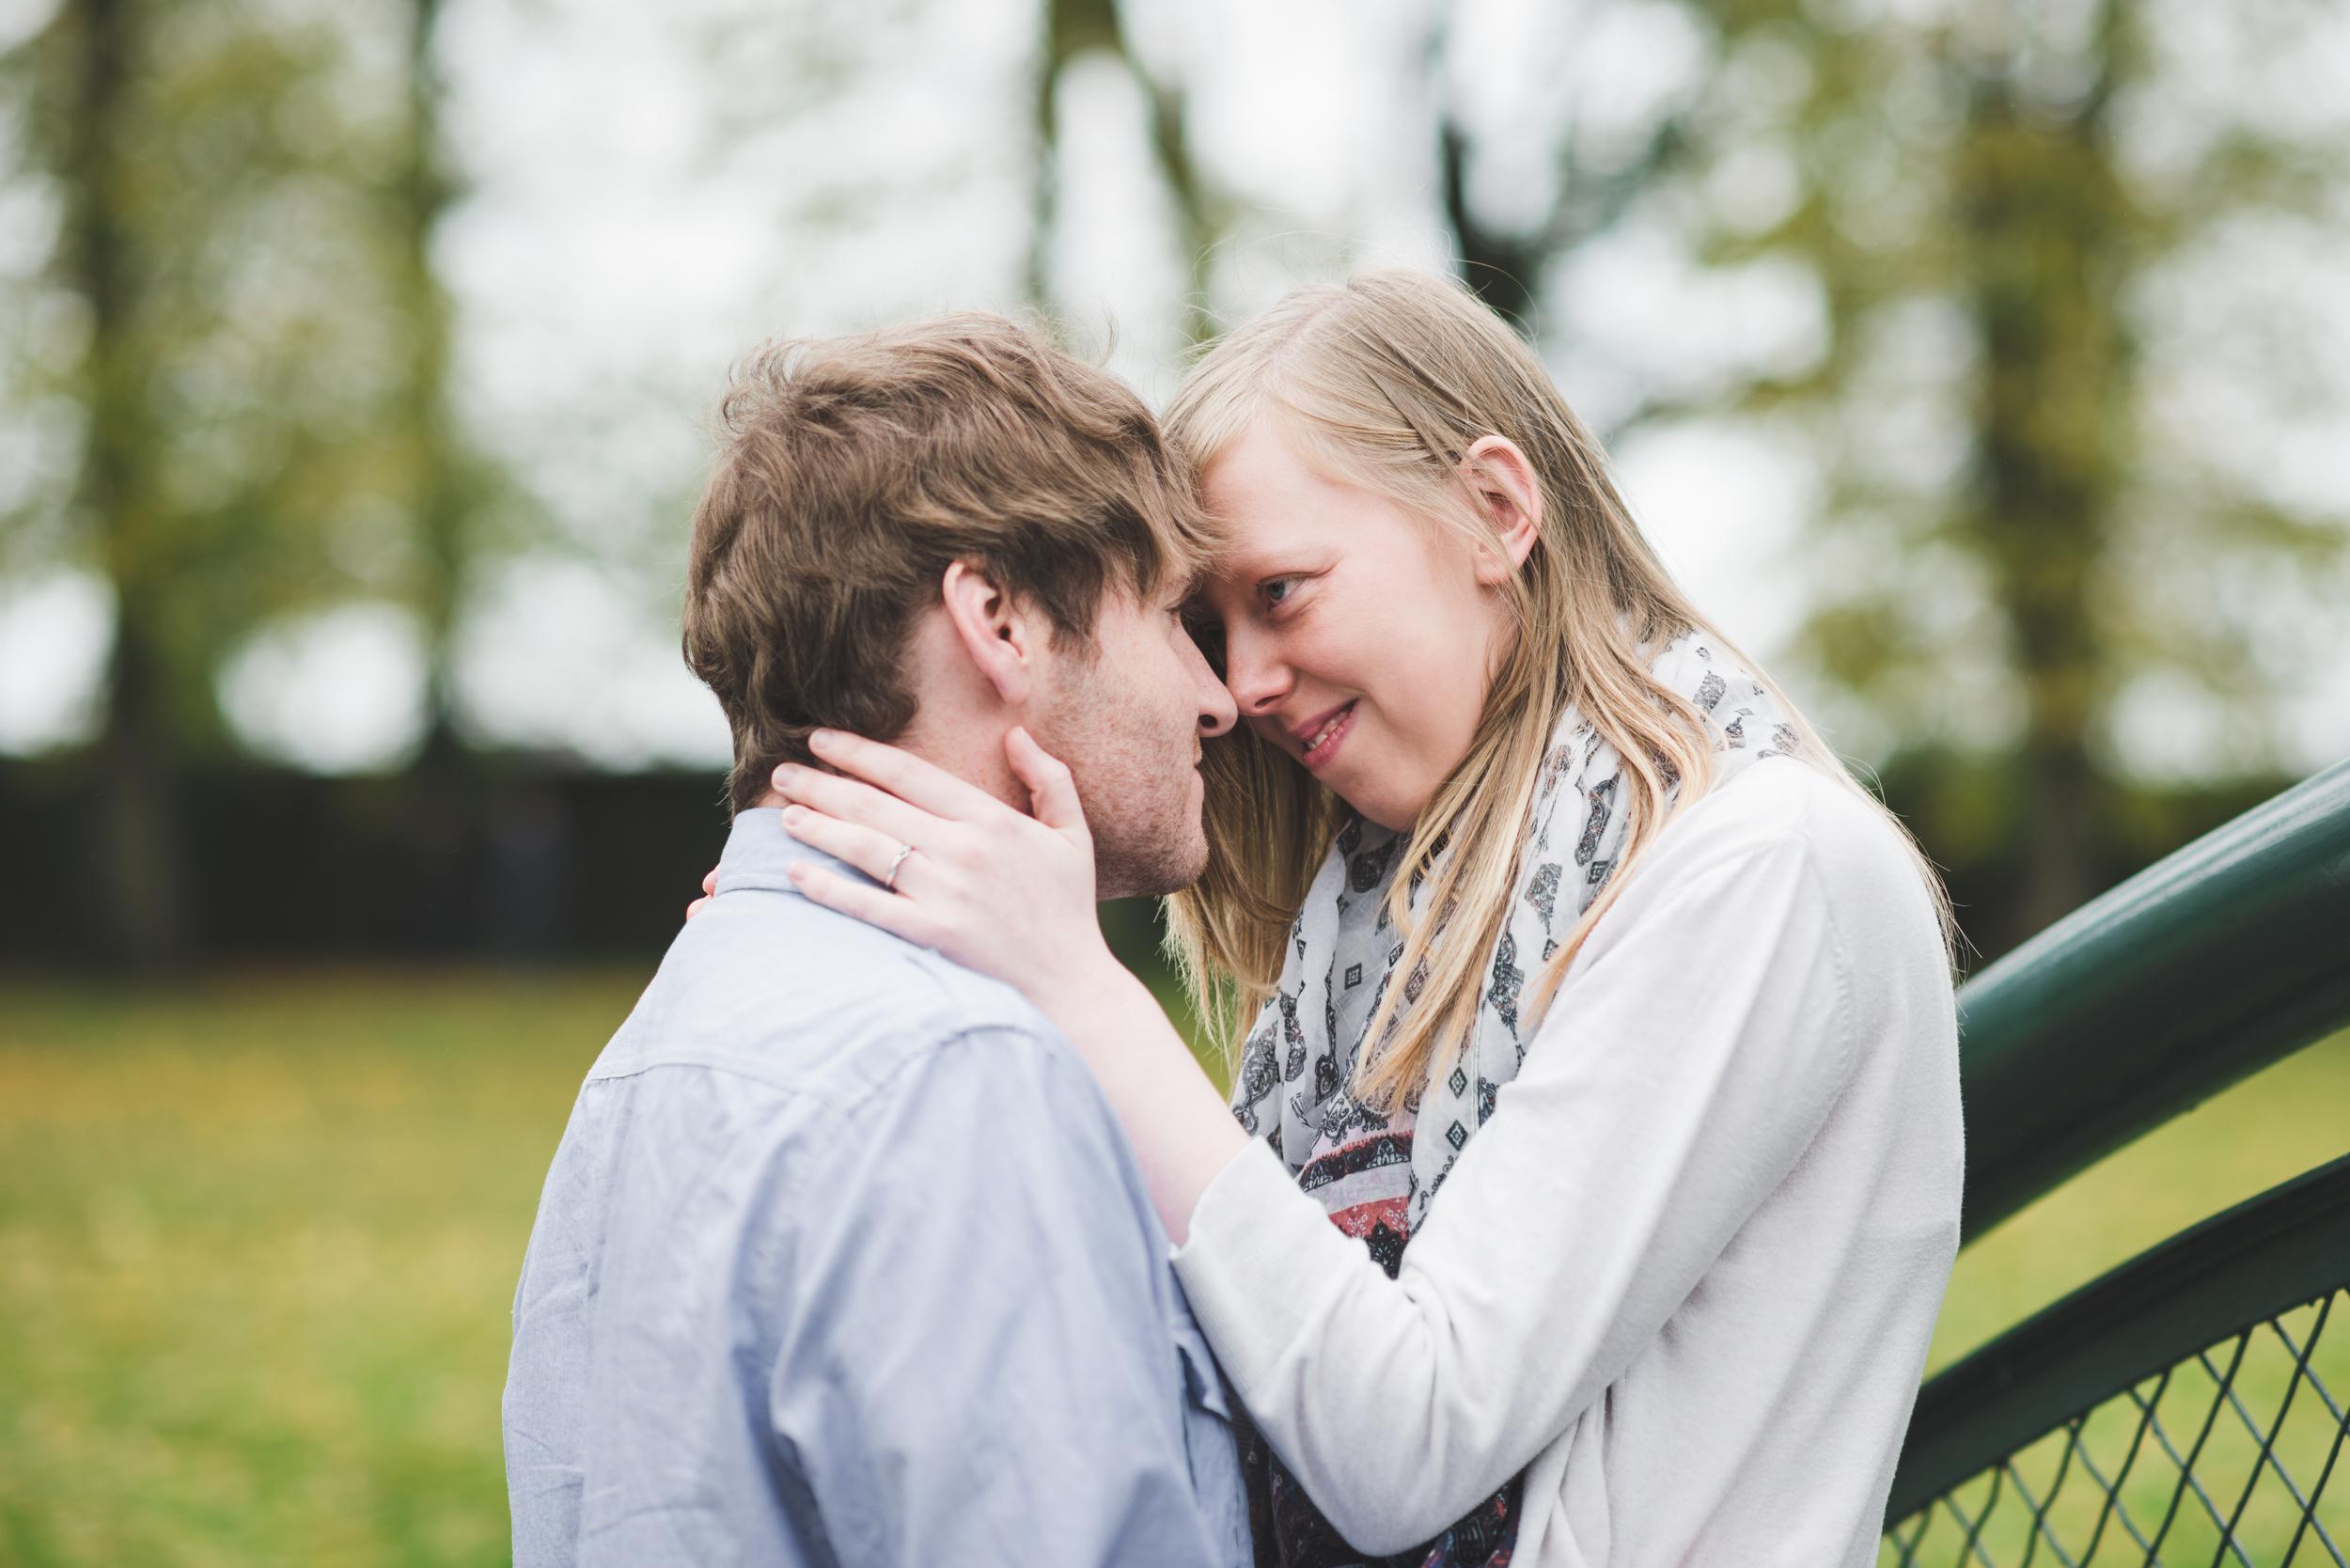 Northern_Ireland_Engagement_Photography_purephotoni_Lurgan_Park_Love